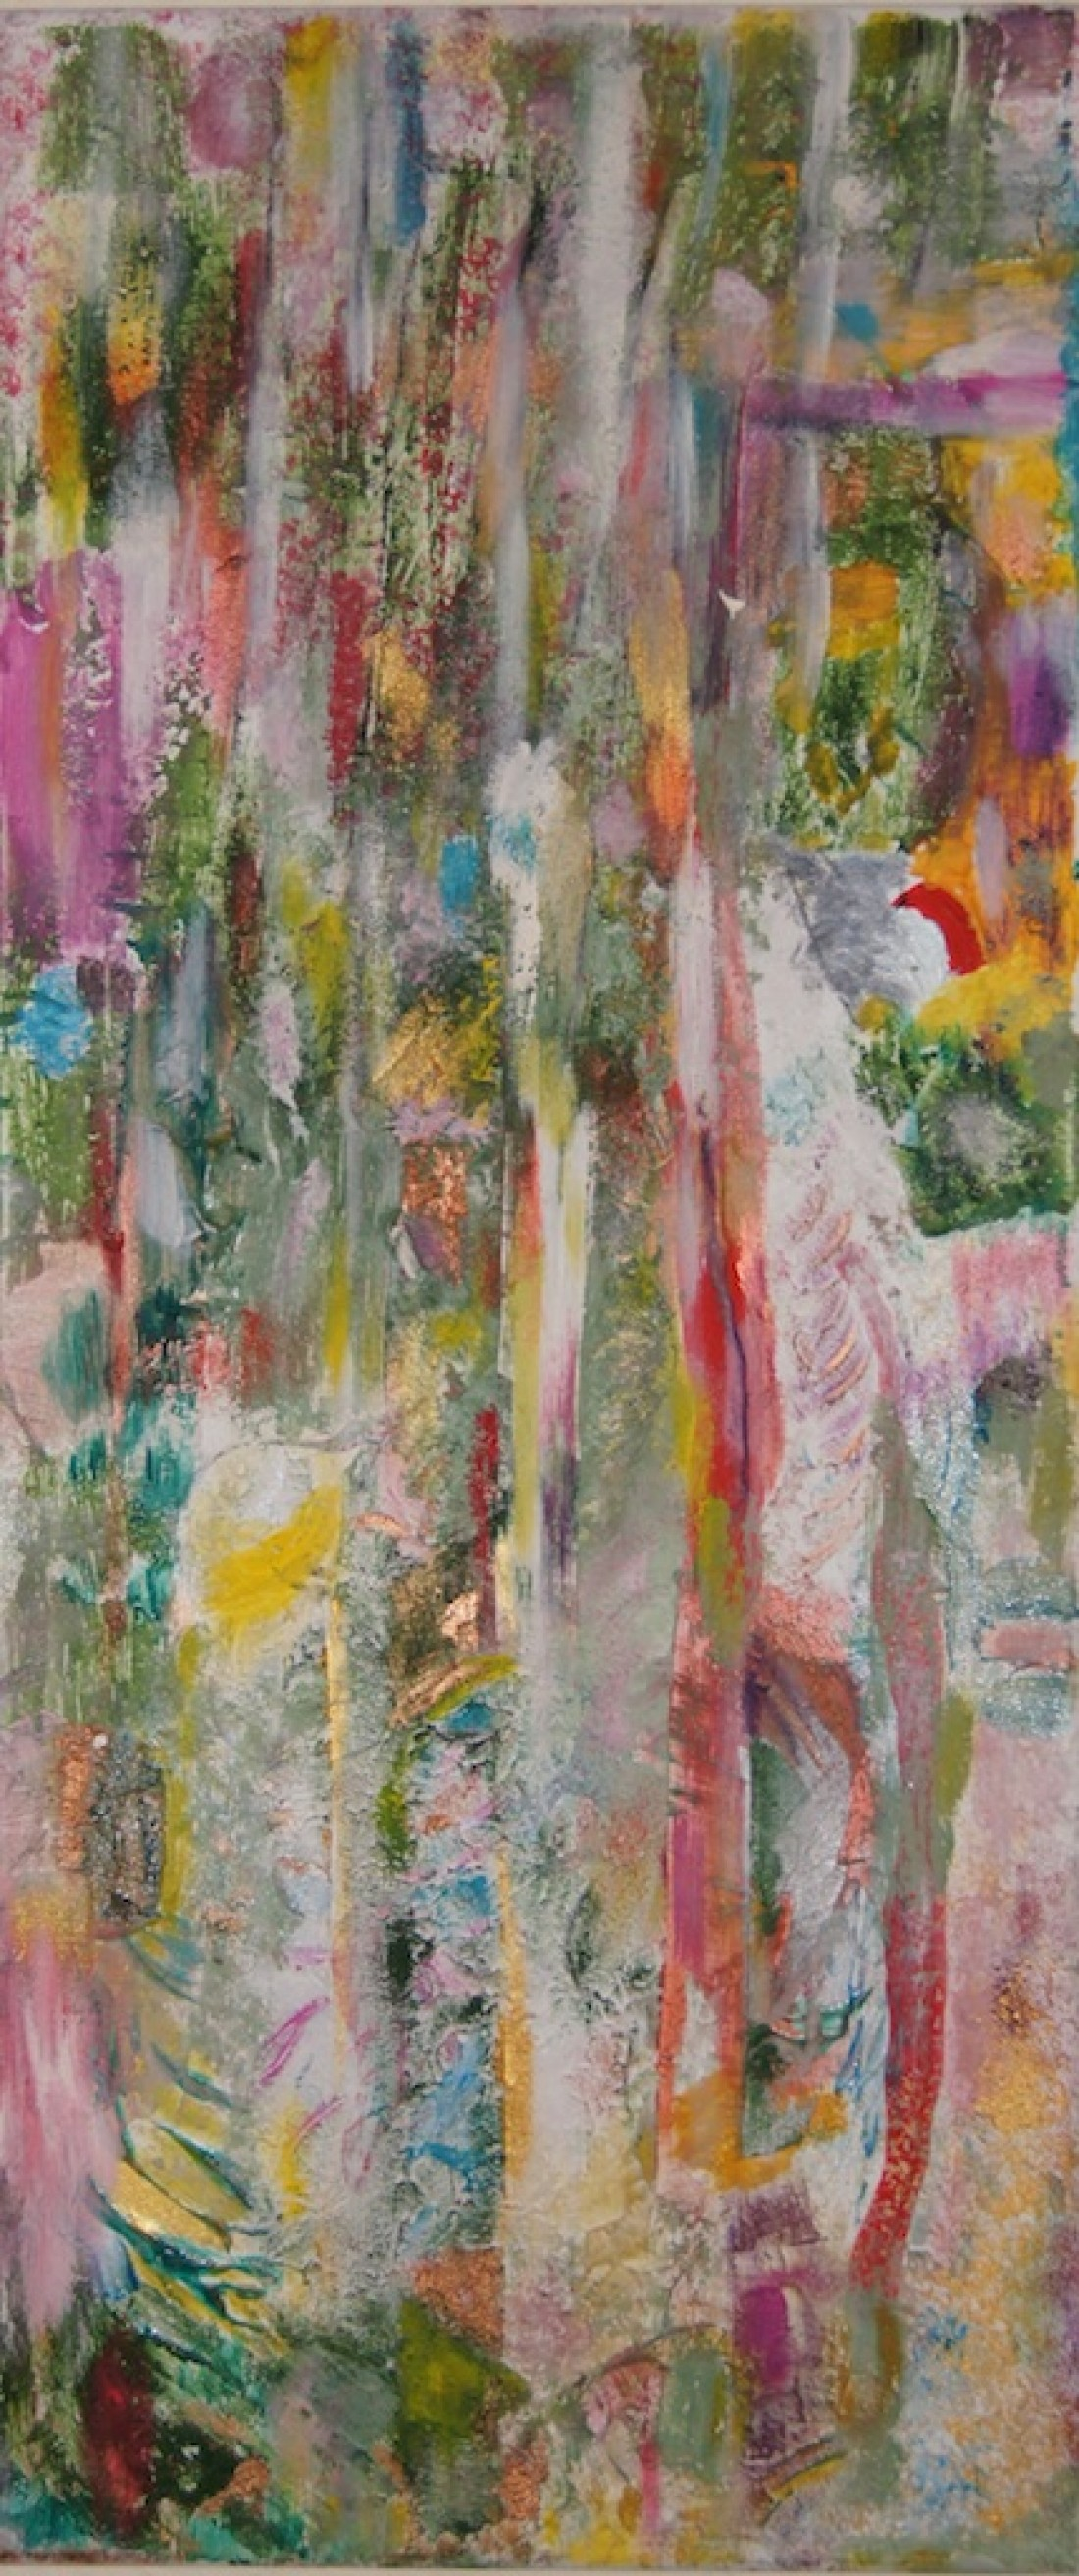 Adela Rodriguez - Olor a Primavera